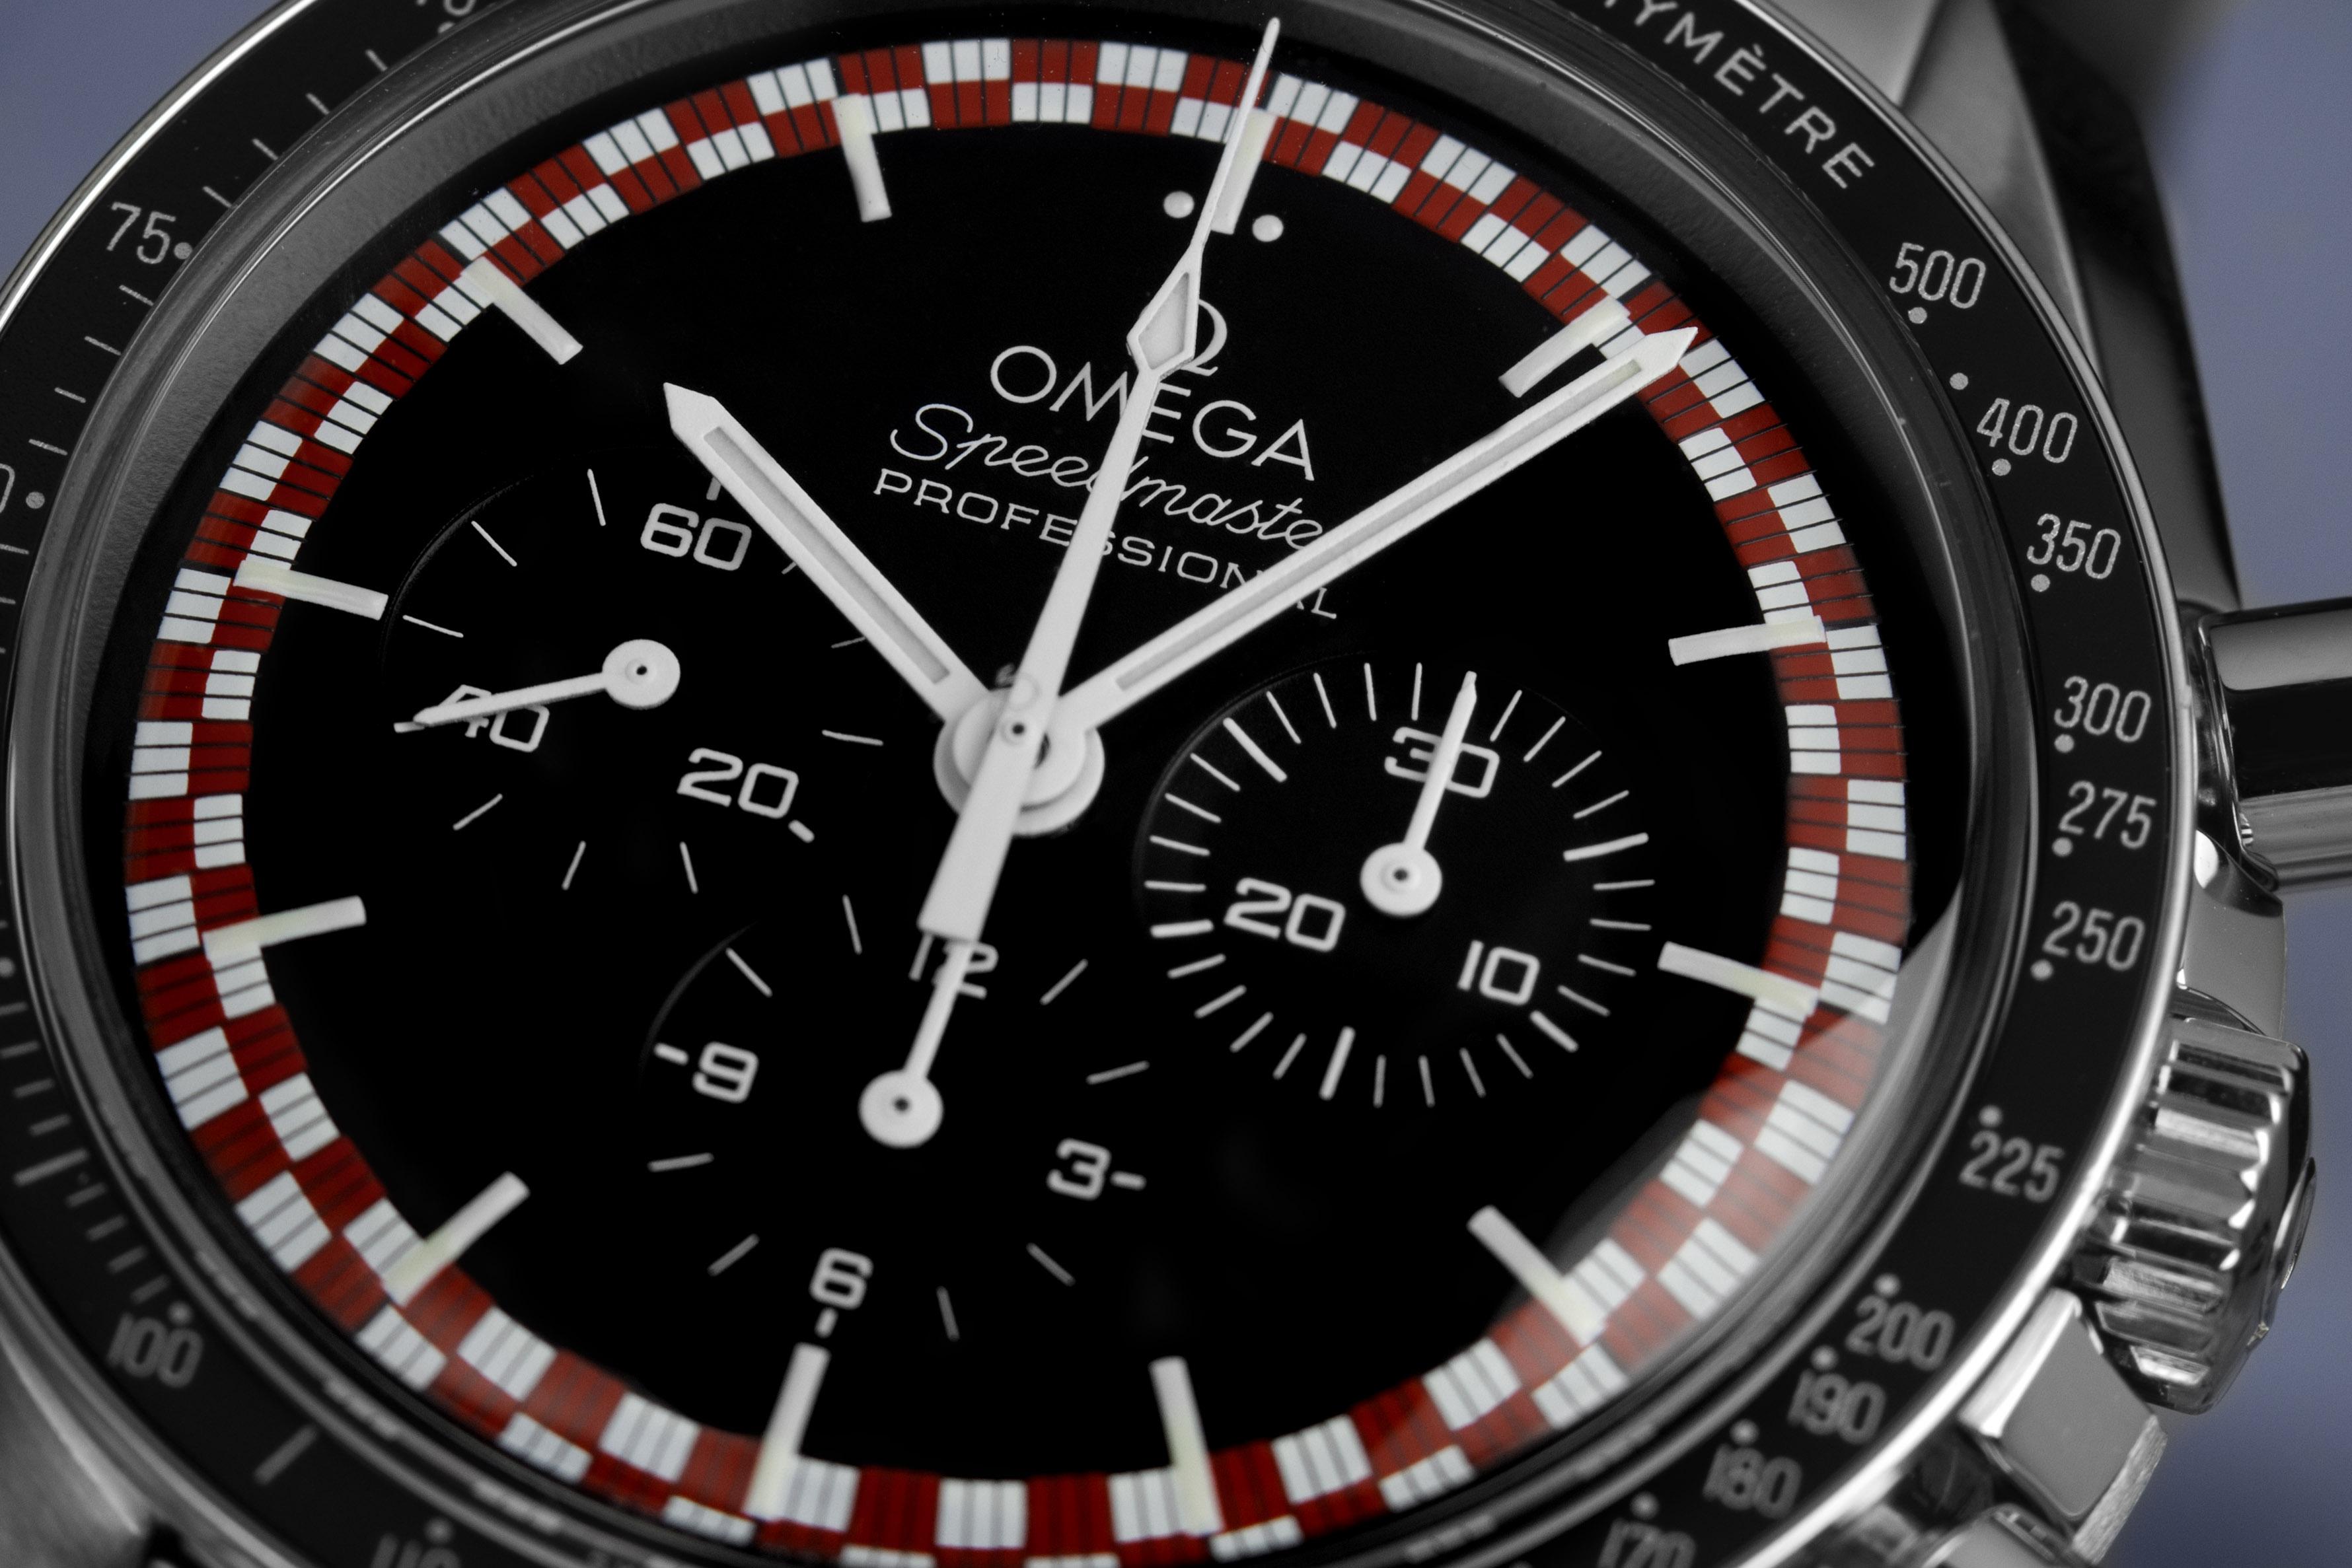 Omega_Speedmaster_Professional_Moonwatch